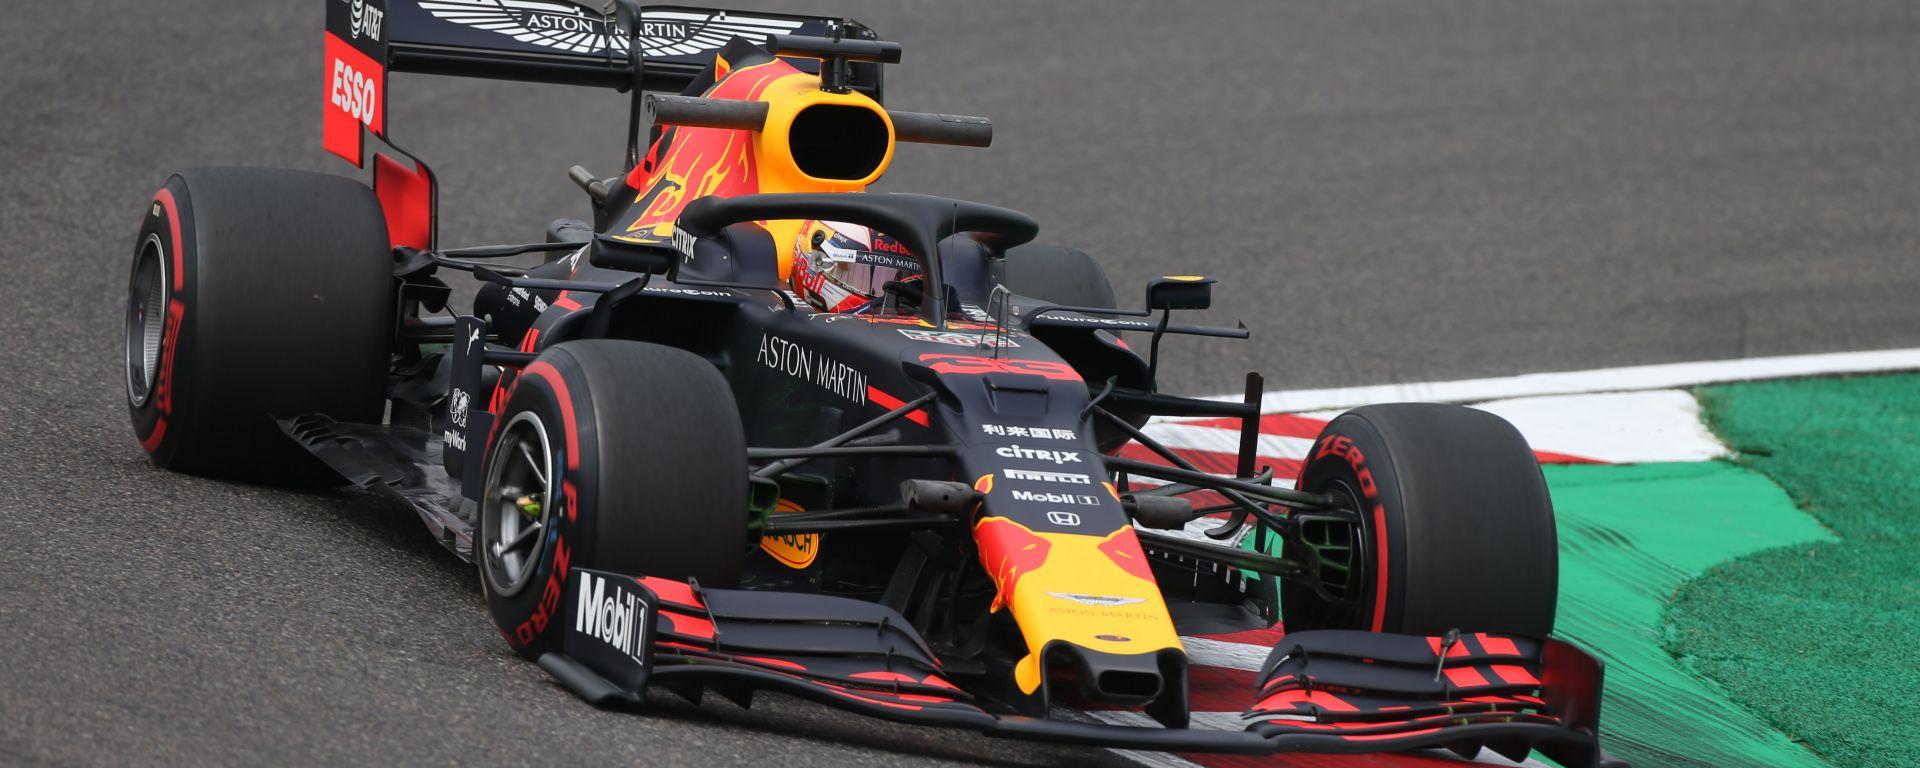 F1 GP Giappone 2019, Suzuka: Max Verstappen (Red Bull)